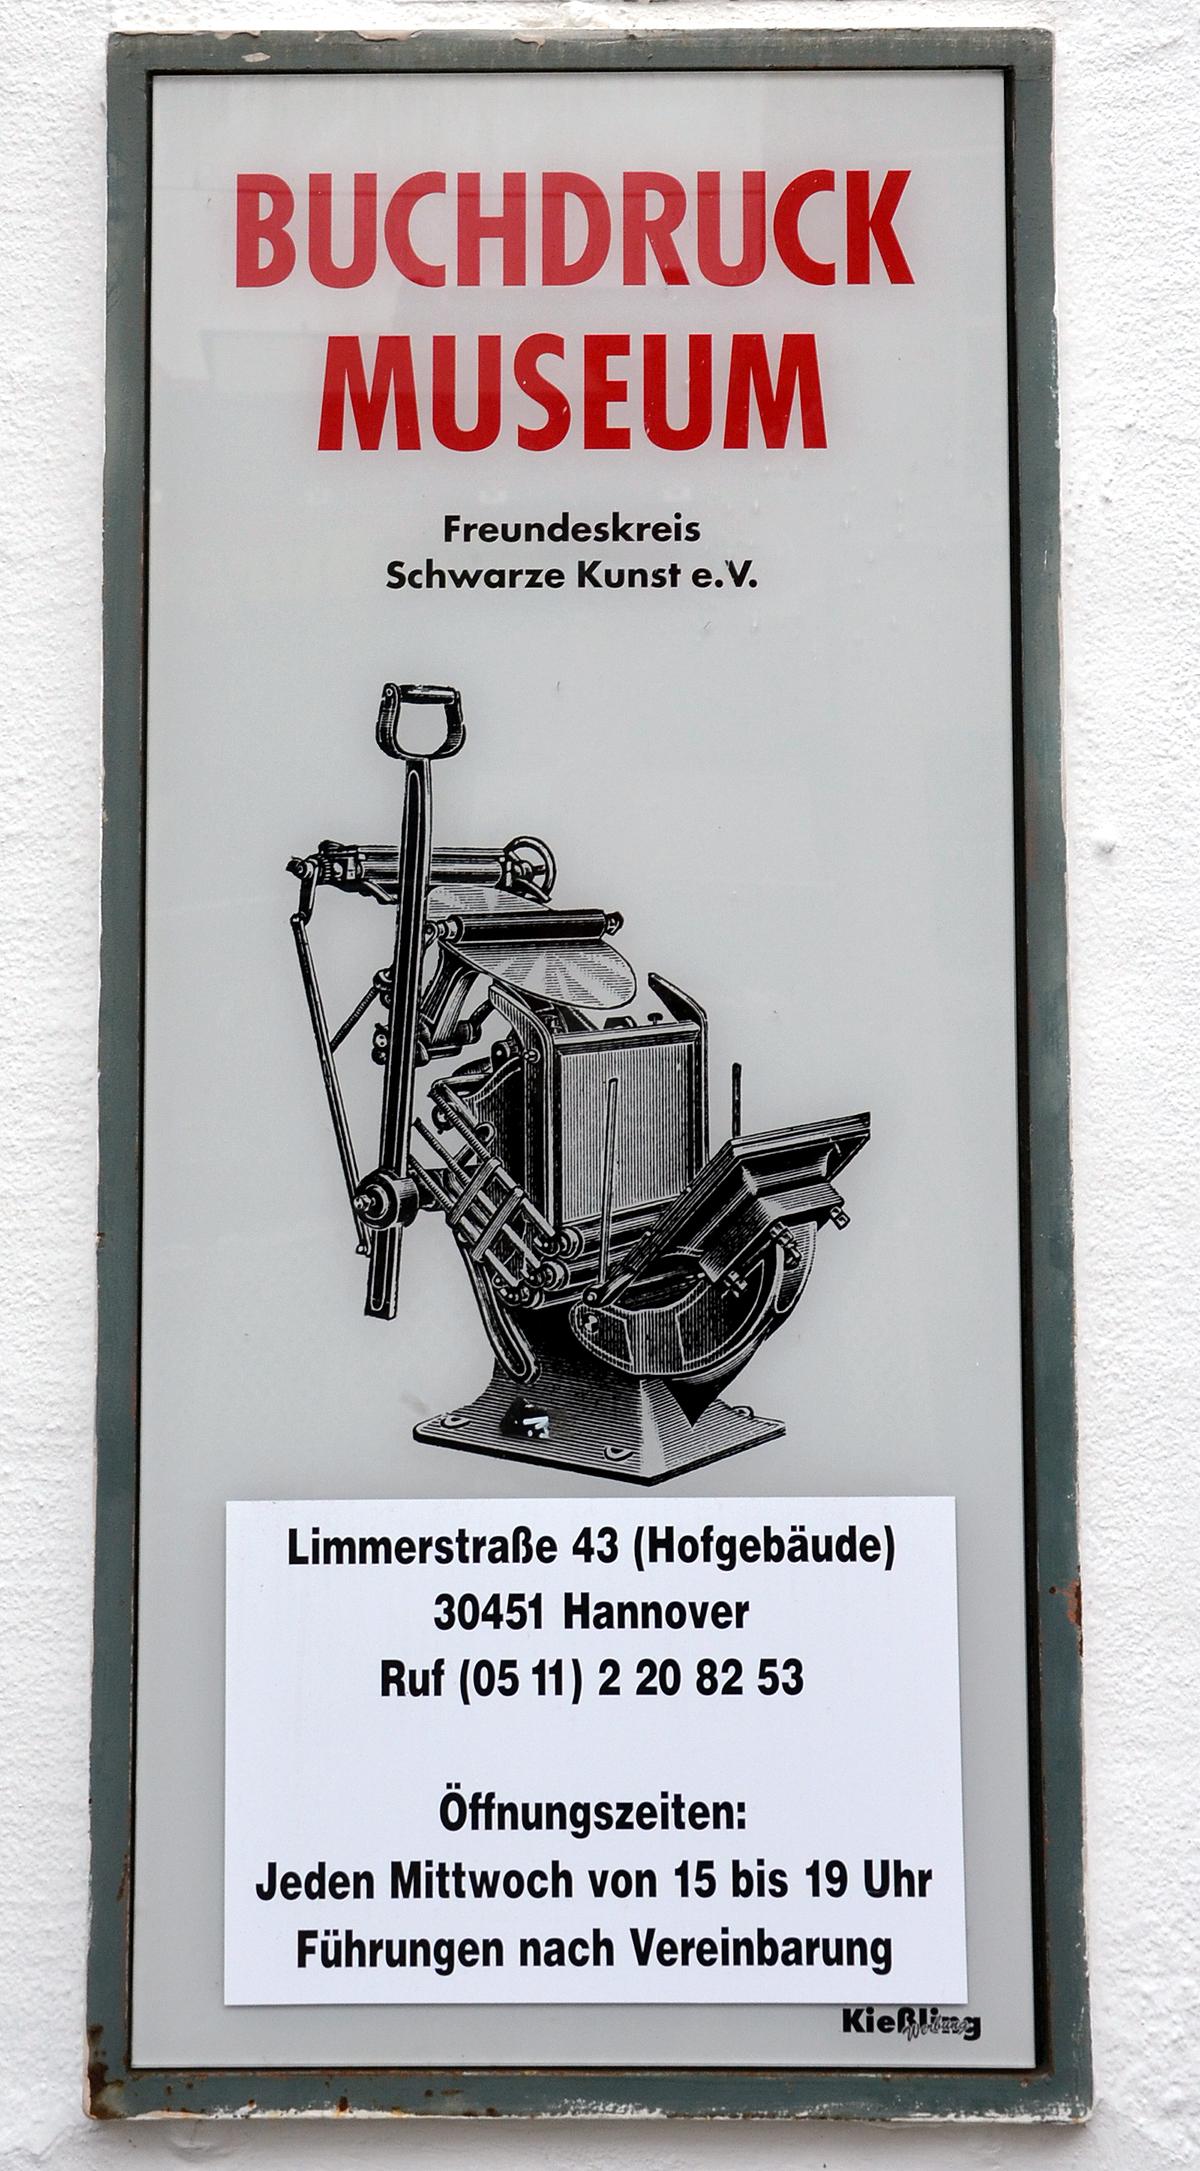 datei buchdruck museum limmerstra e 43 30451 hannover linden nord freundeskreis schwarze. Black Bedroom Furniture Sets. Home Design Ideas